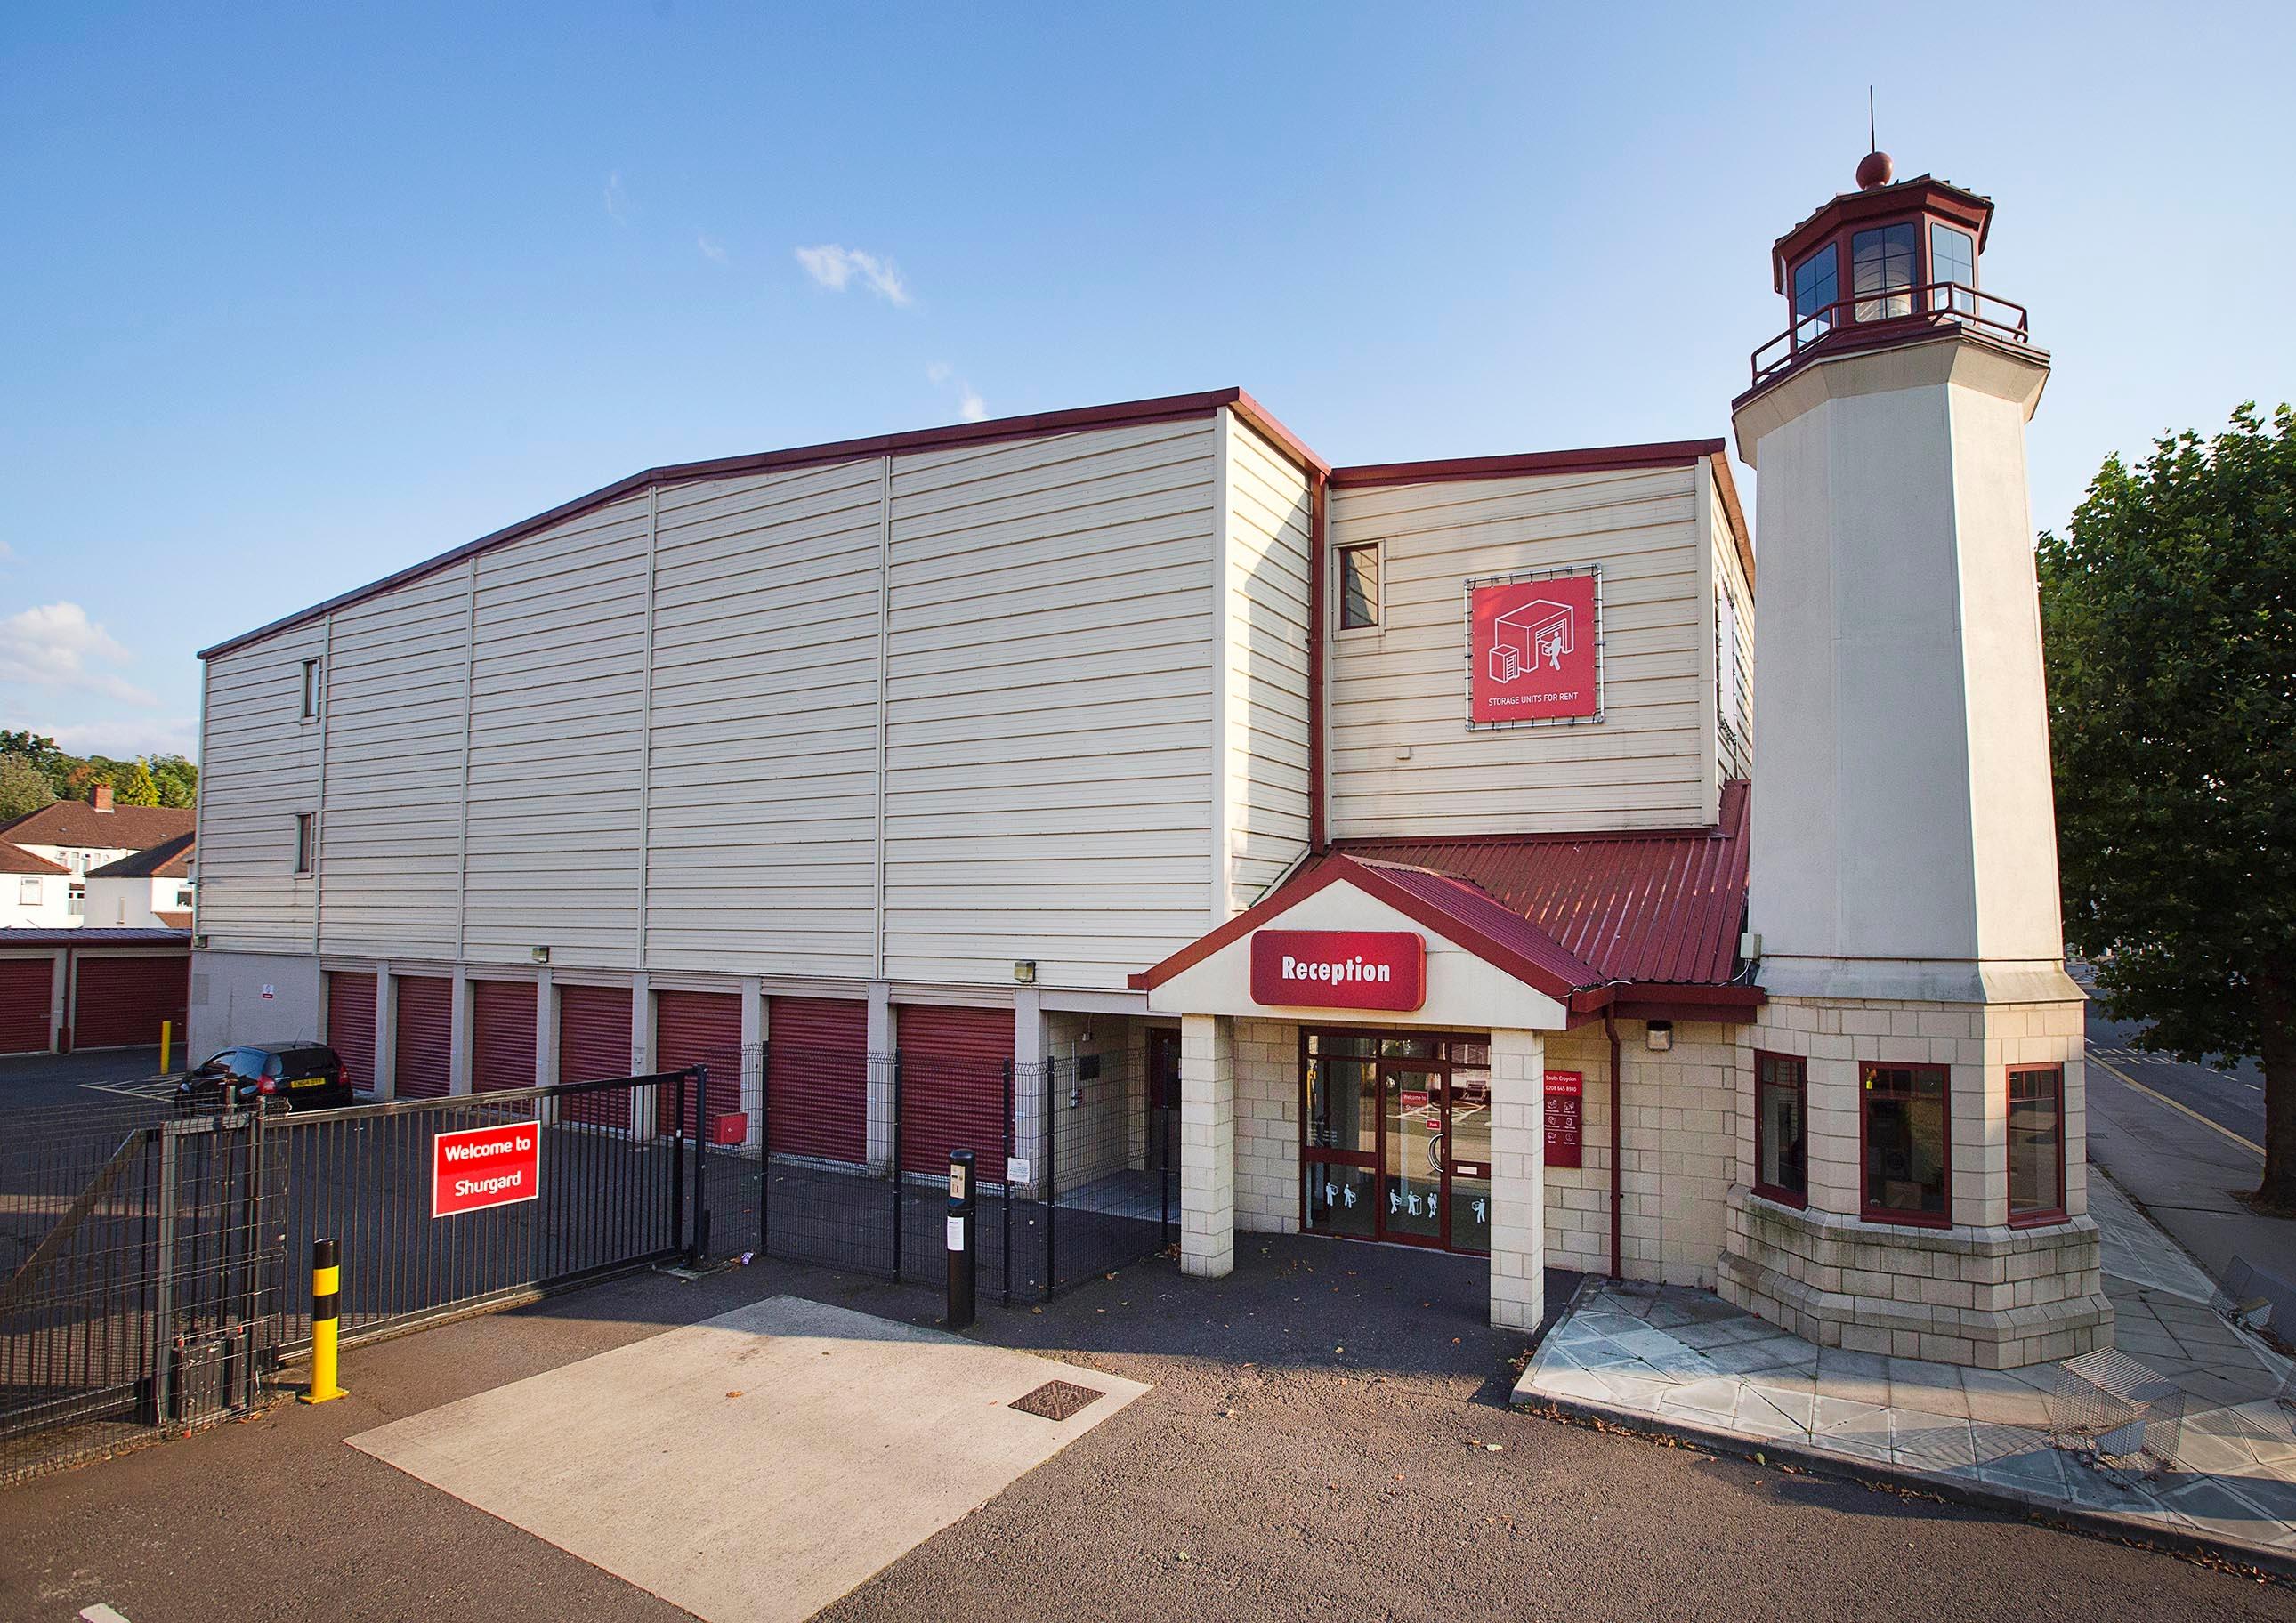 Shurgard Self-Storage South Croydon